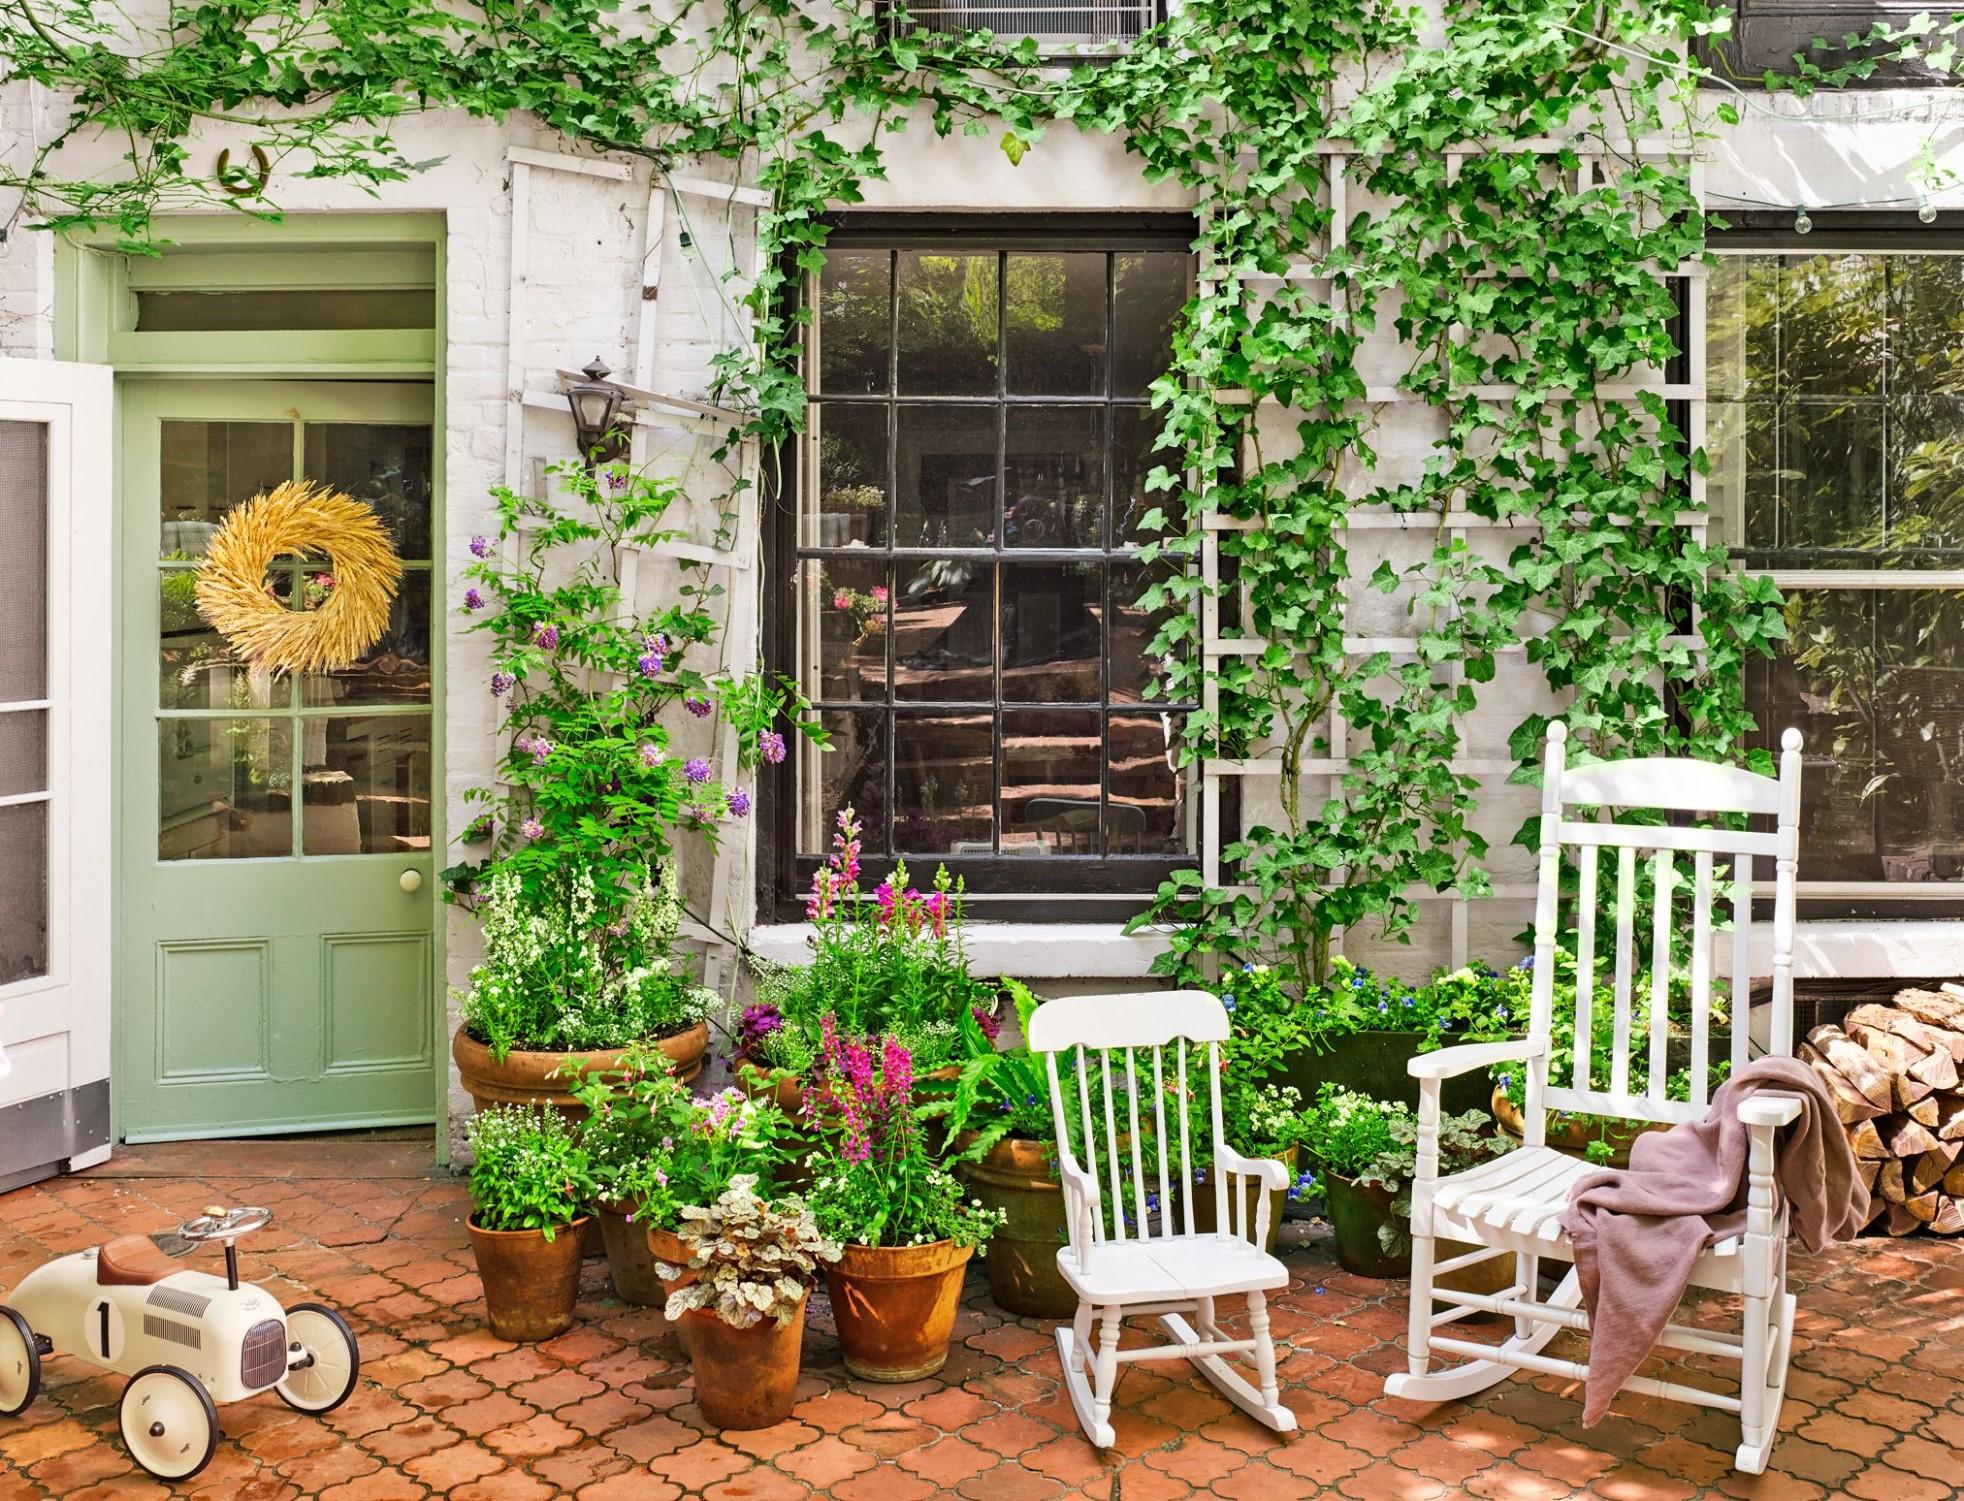 10 Creative Small Garden Ideas - Indoor and Outdoor Garden Designs  - Apartment Yard Design